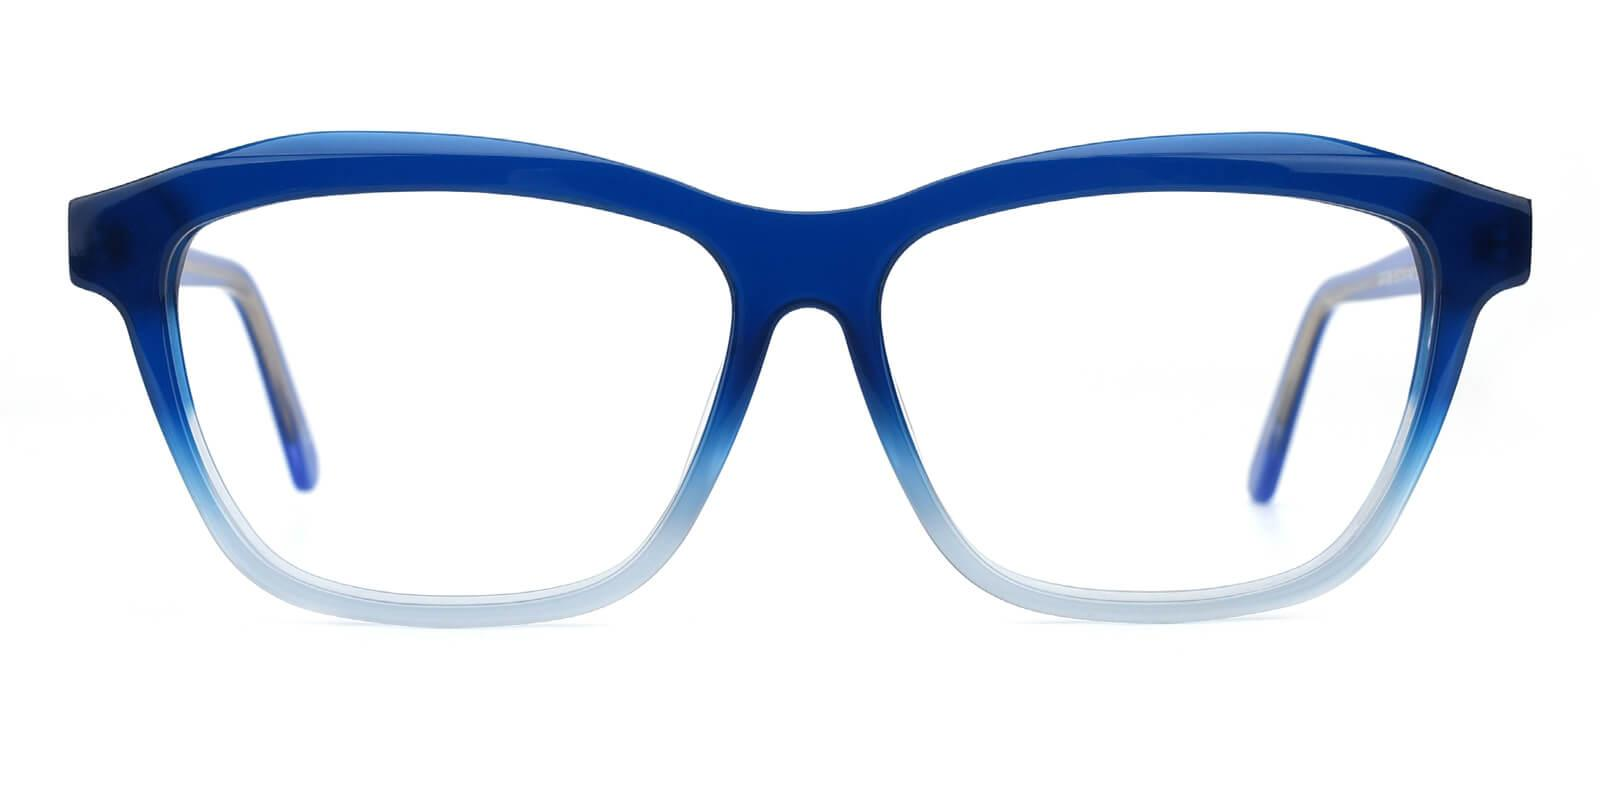 Gate-Blue-Square / Cat-Acetate-Eyeglasses-additional2